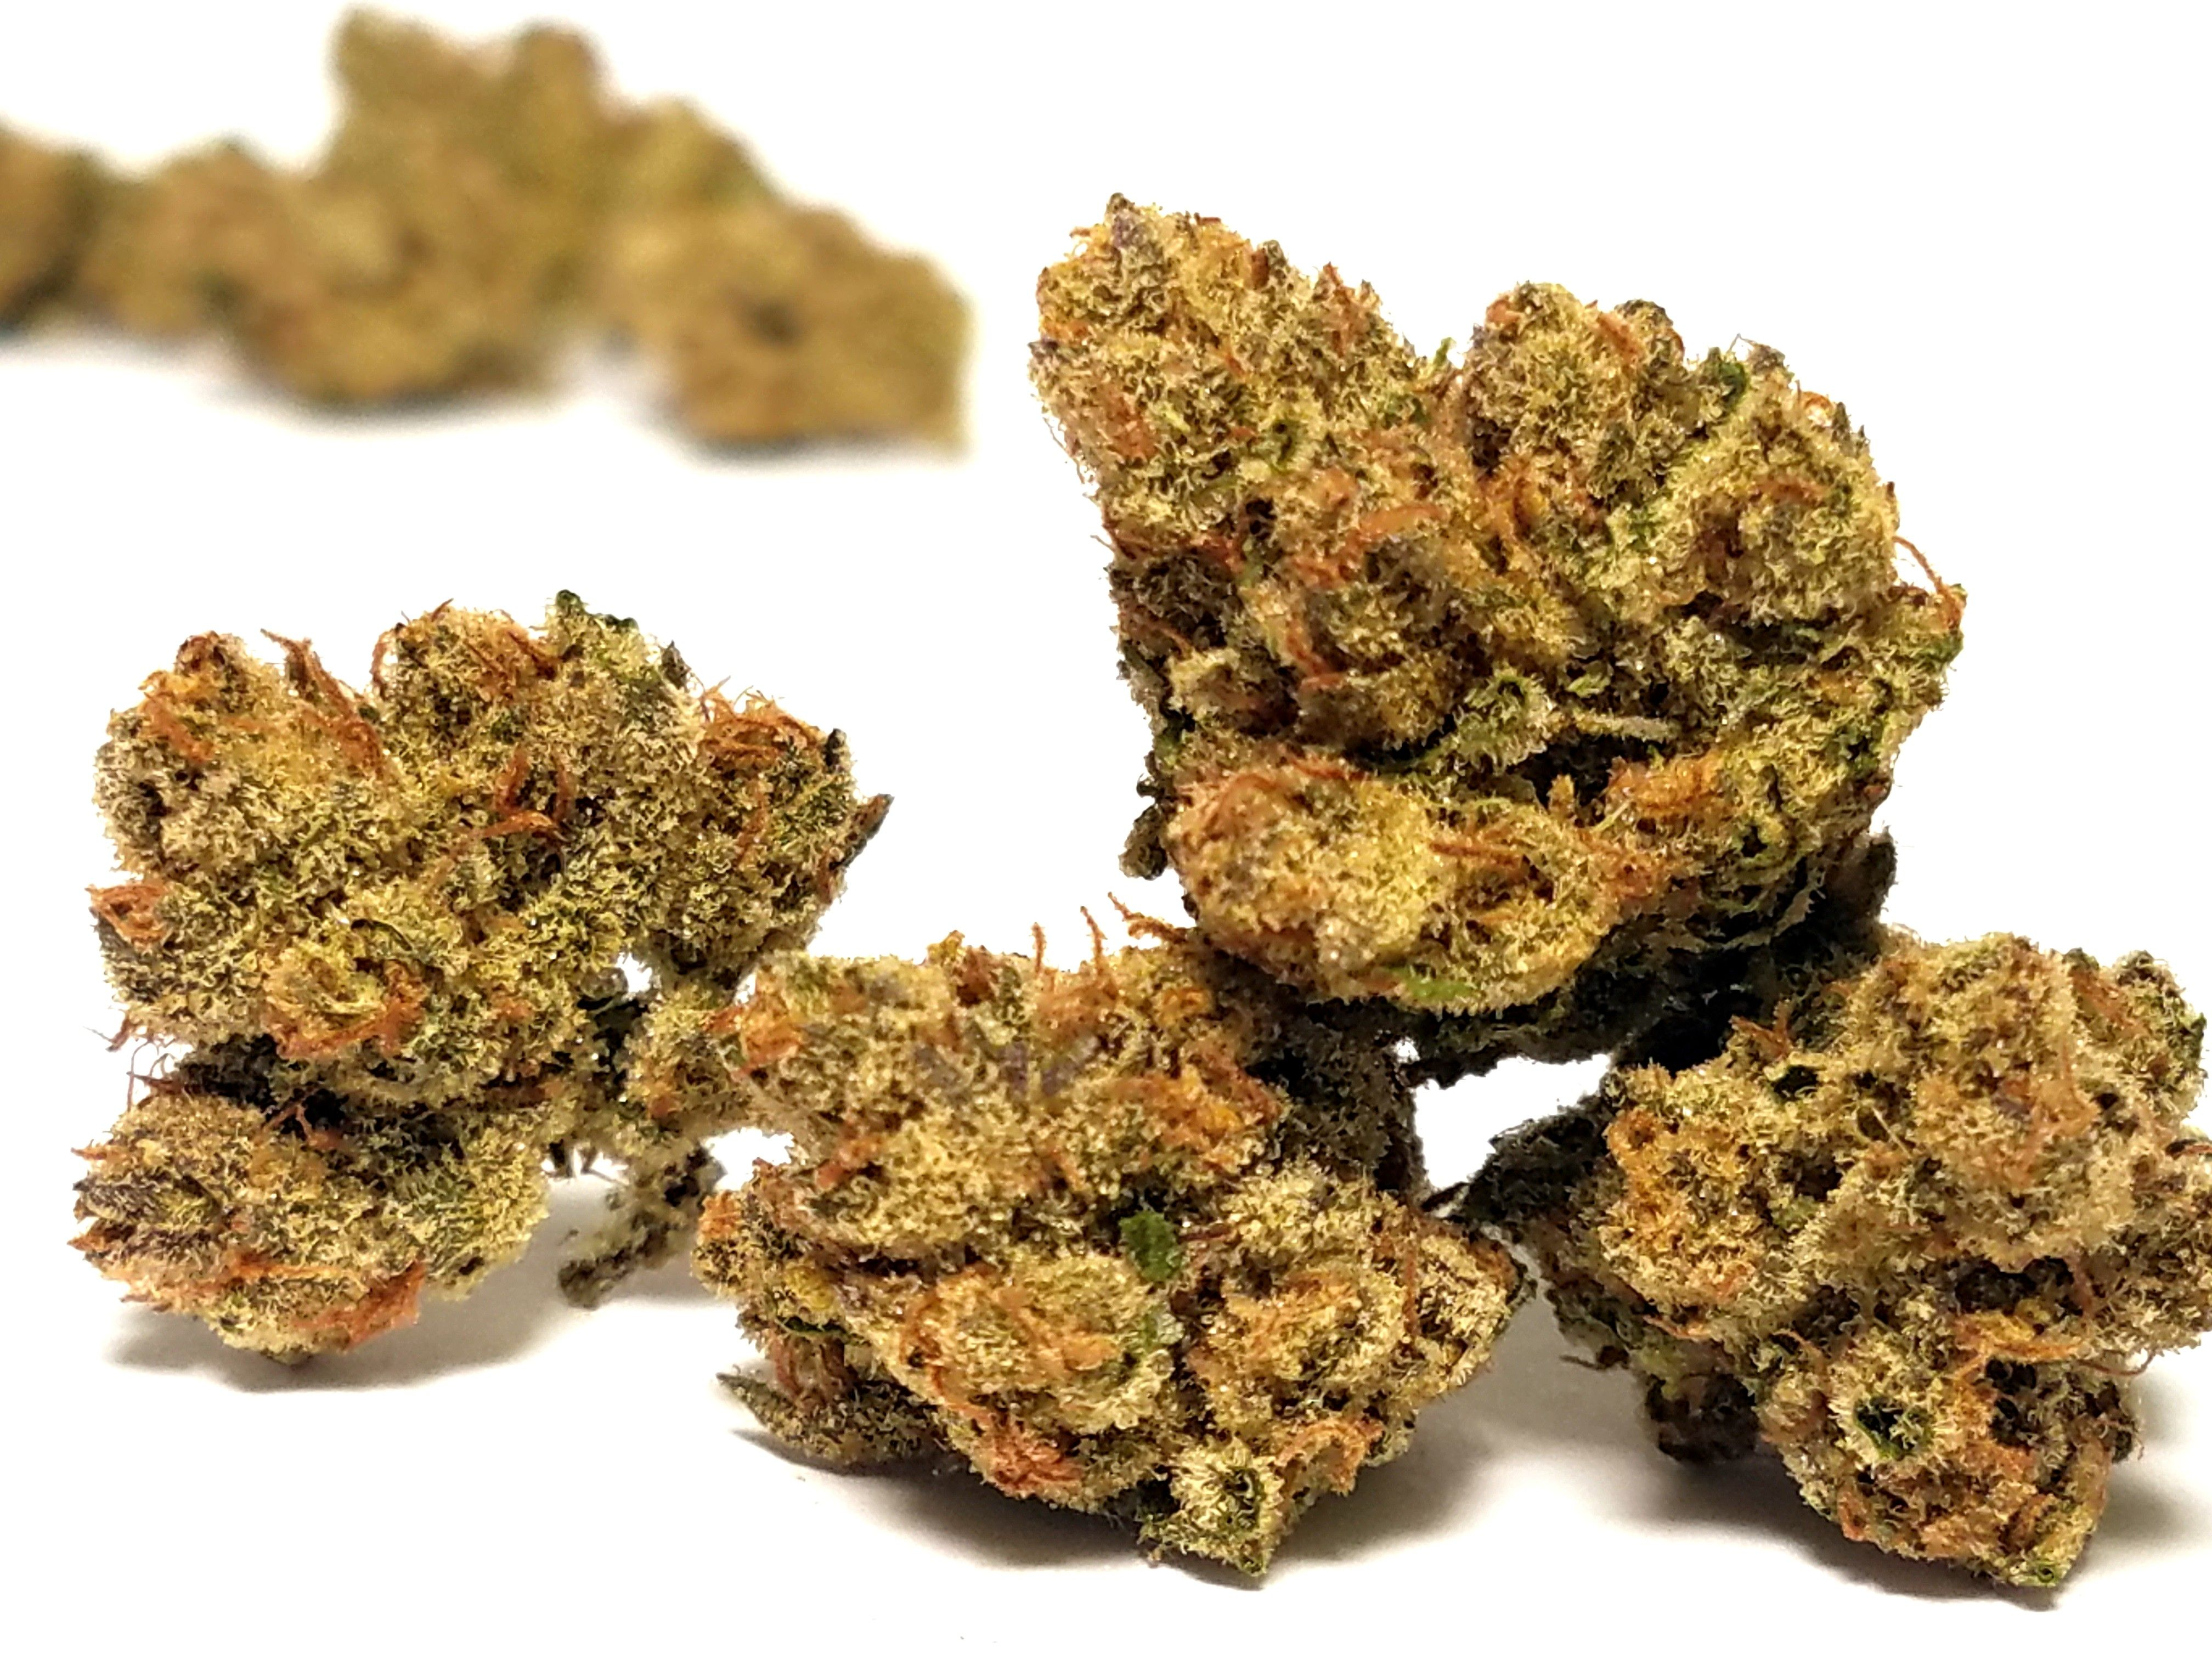 Gnome Grown - Lemon Meringue, Sativa, Greenhouse